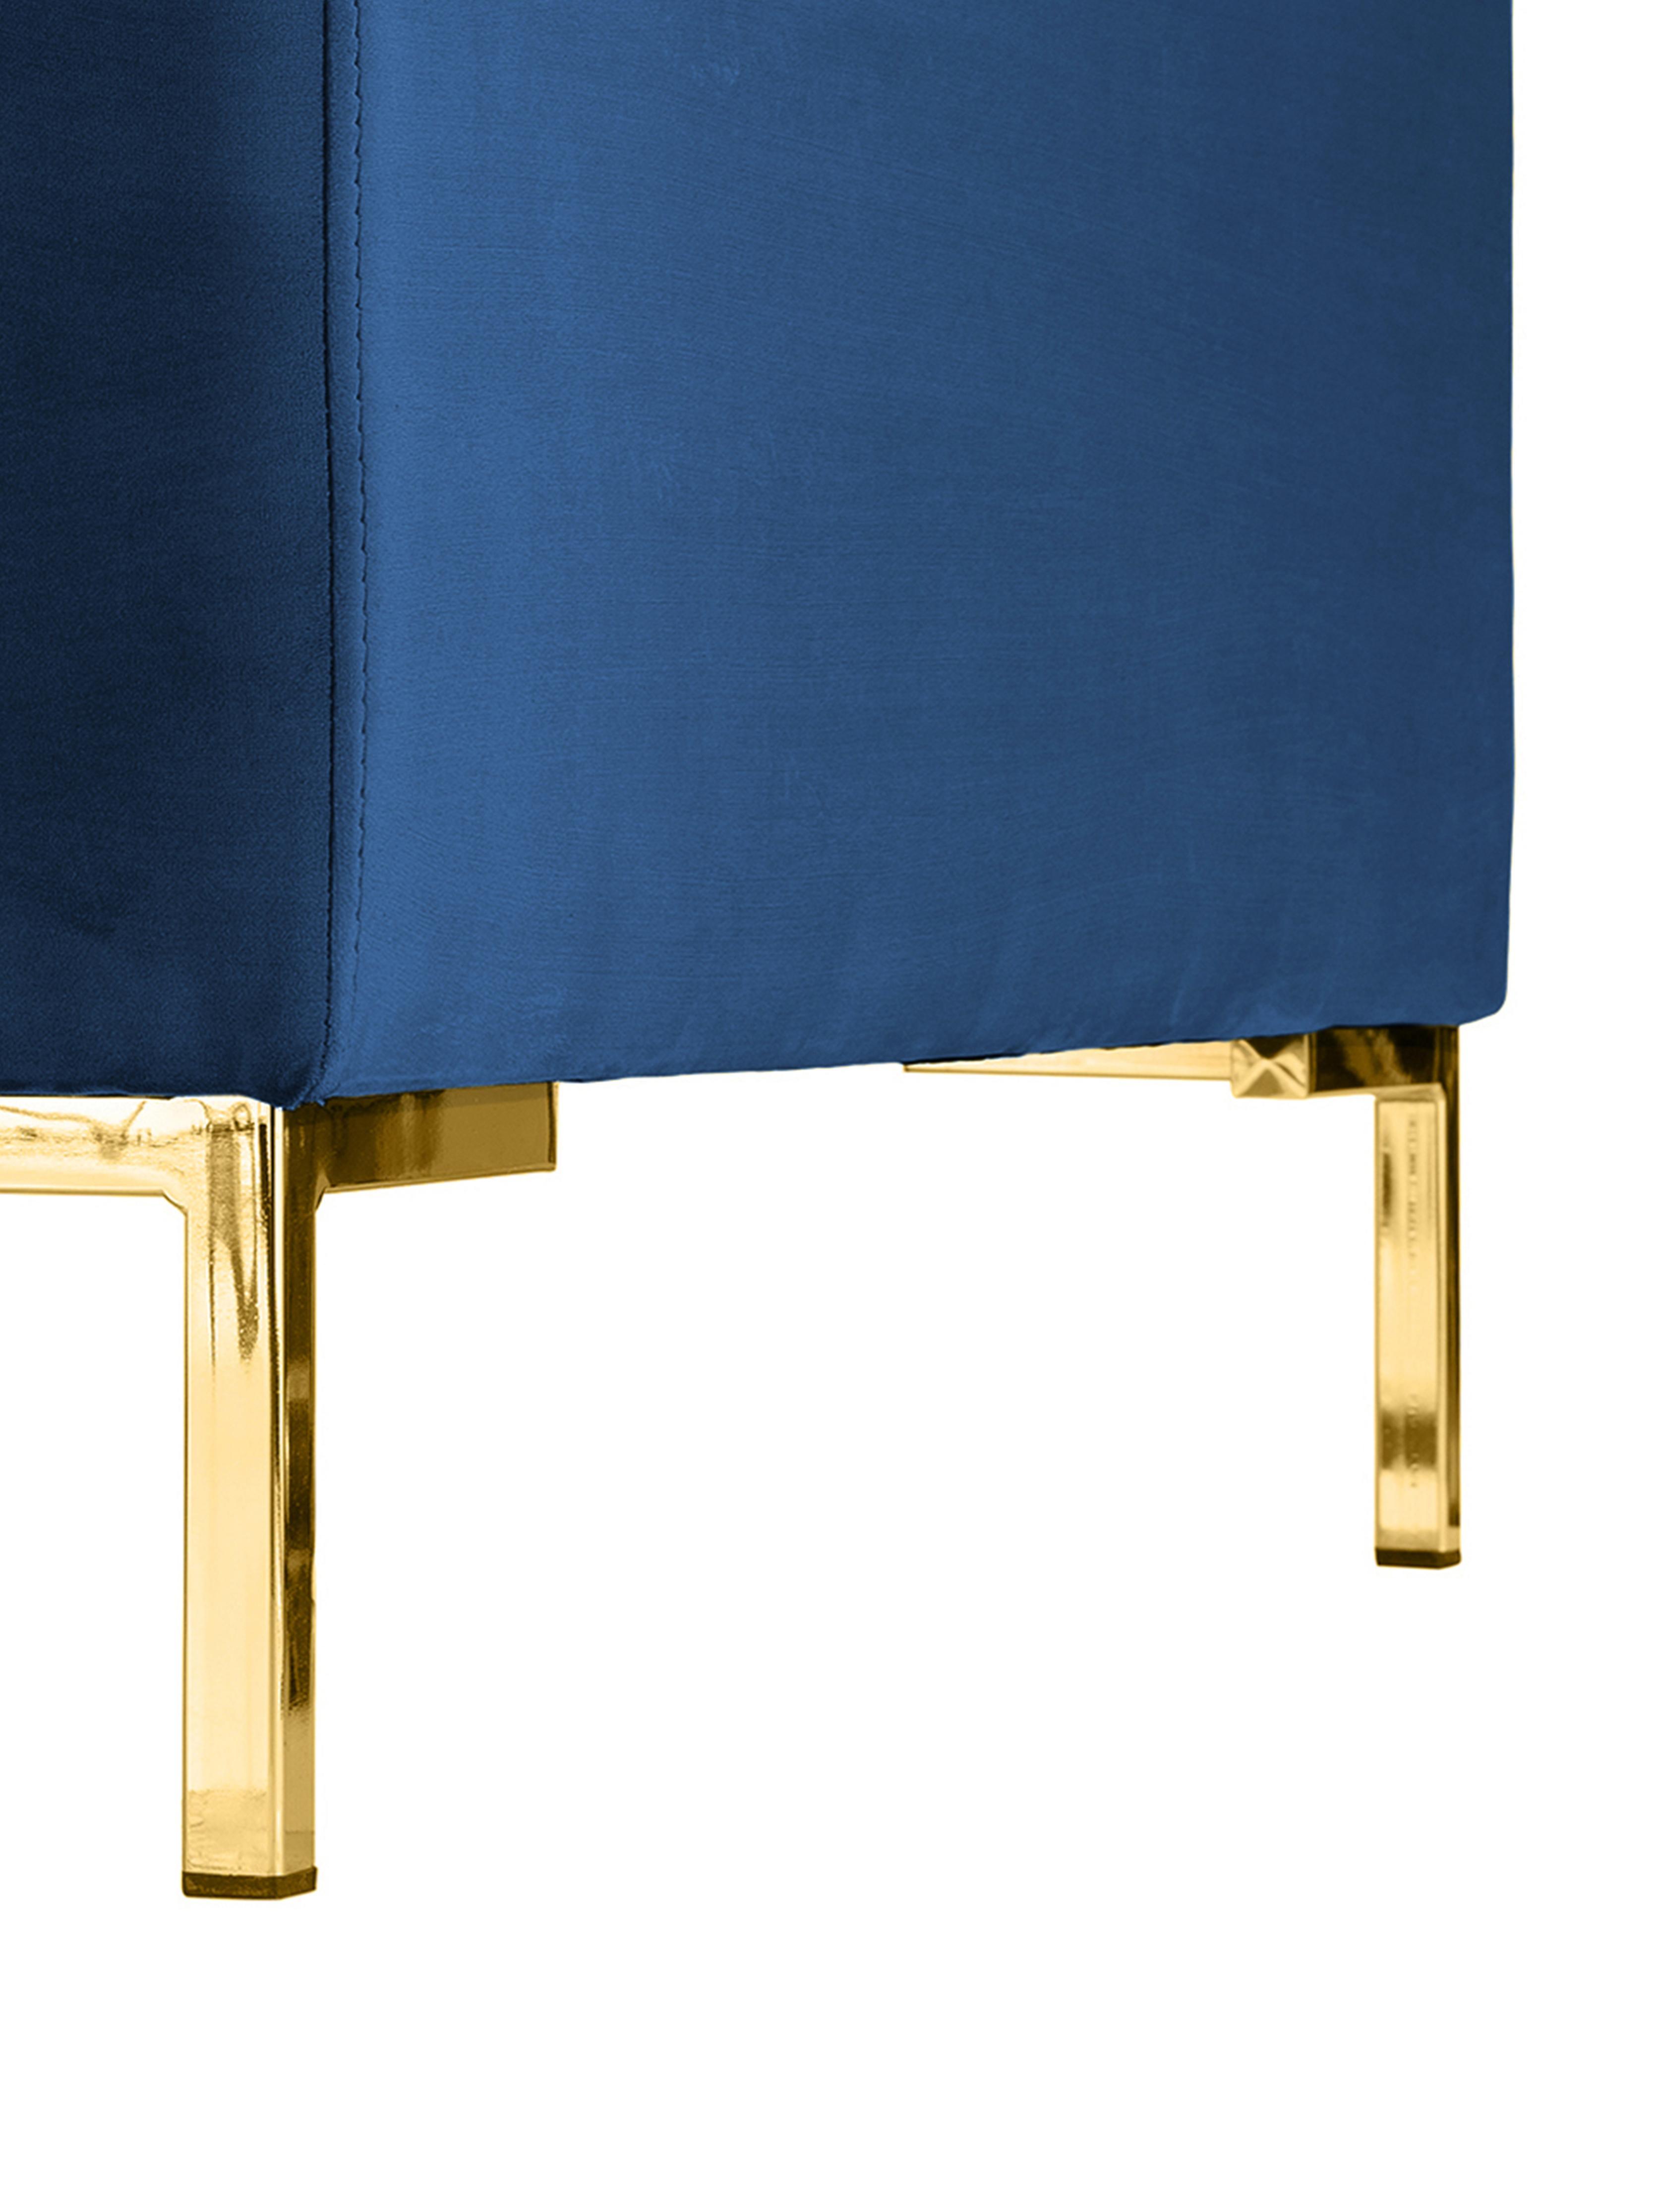 Samt-Ecksofa Luna, Bezug: Samt (Polyester) Der hoch, Gestell: Massives Buchenholz, Füße: Metall, galvanisiert, Samt Blau, Gold, B 280 x T 184 cm